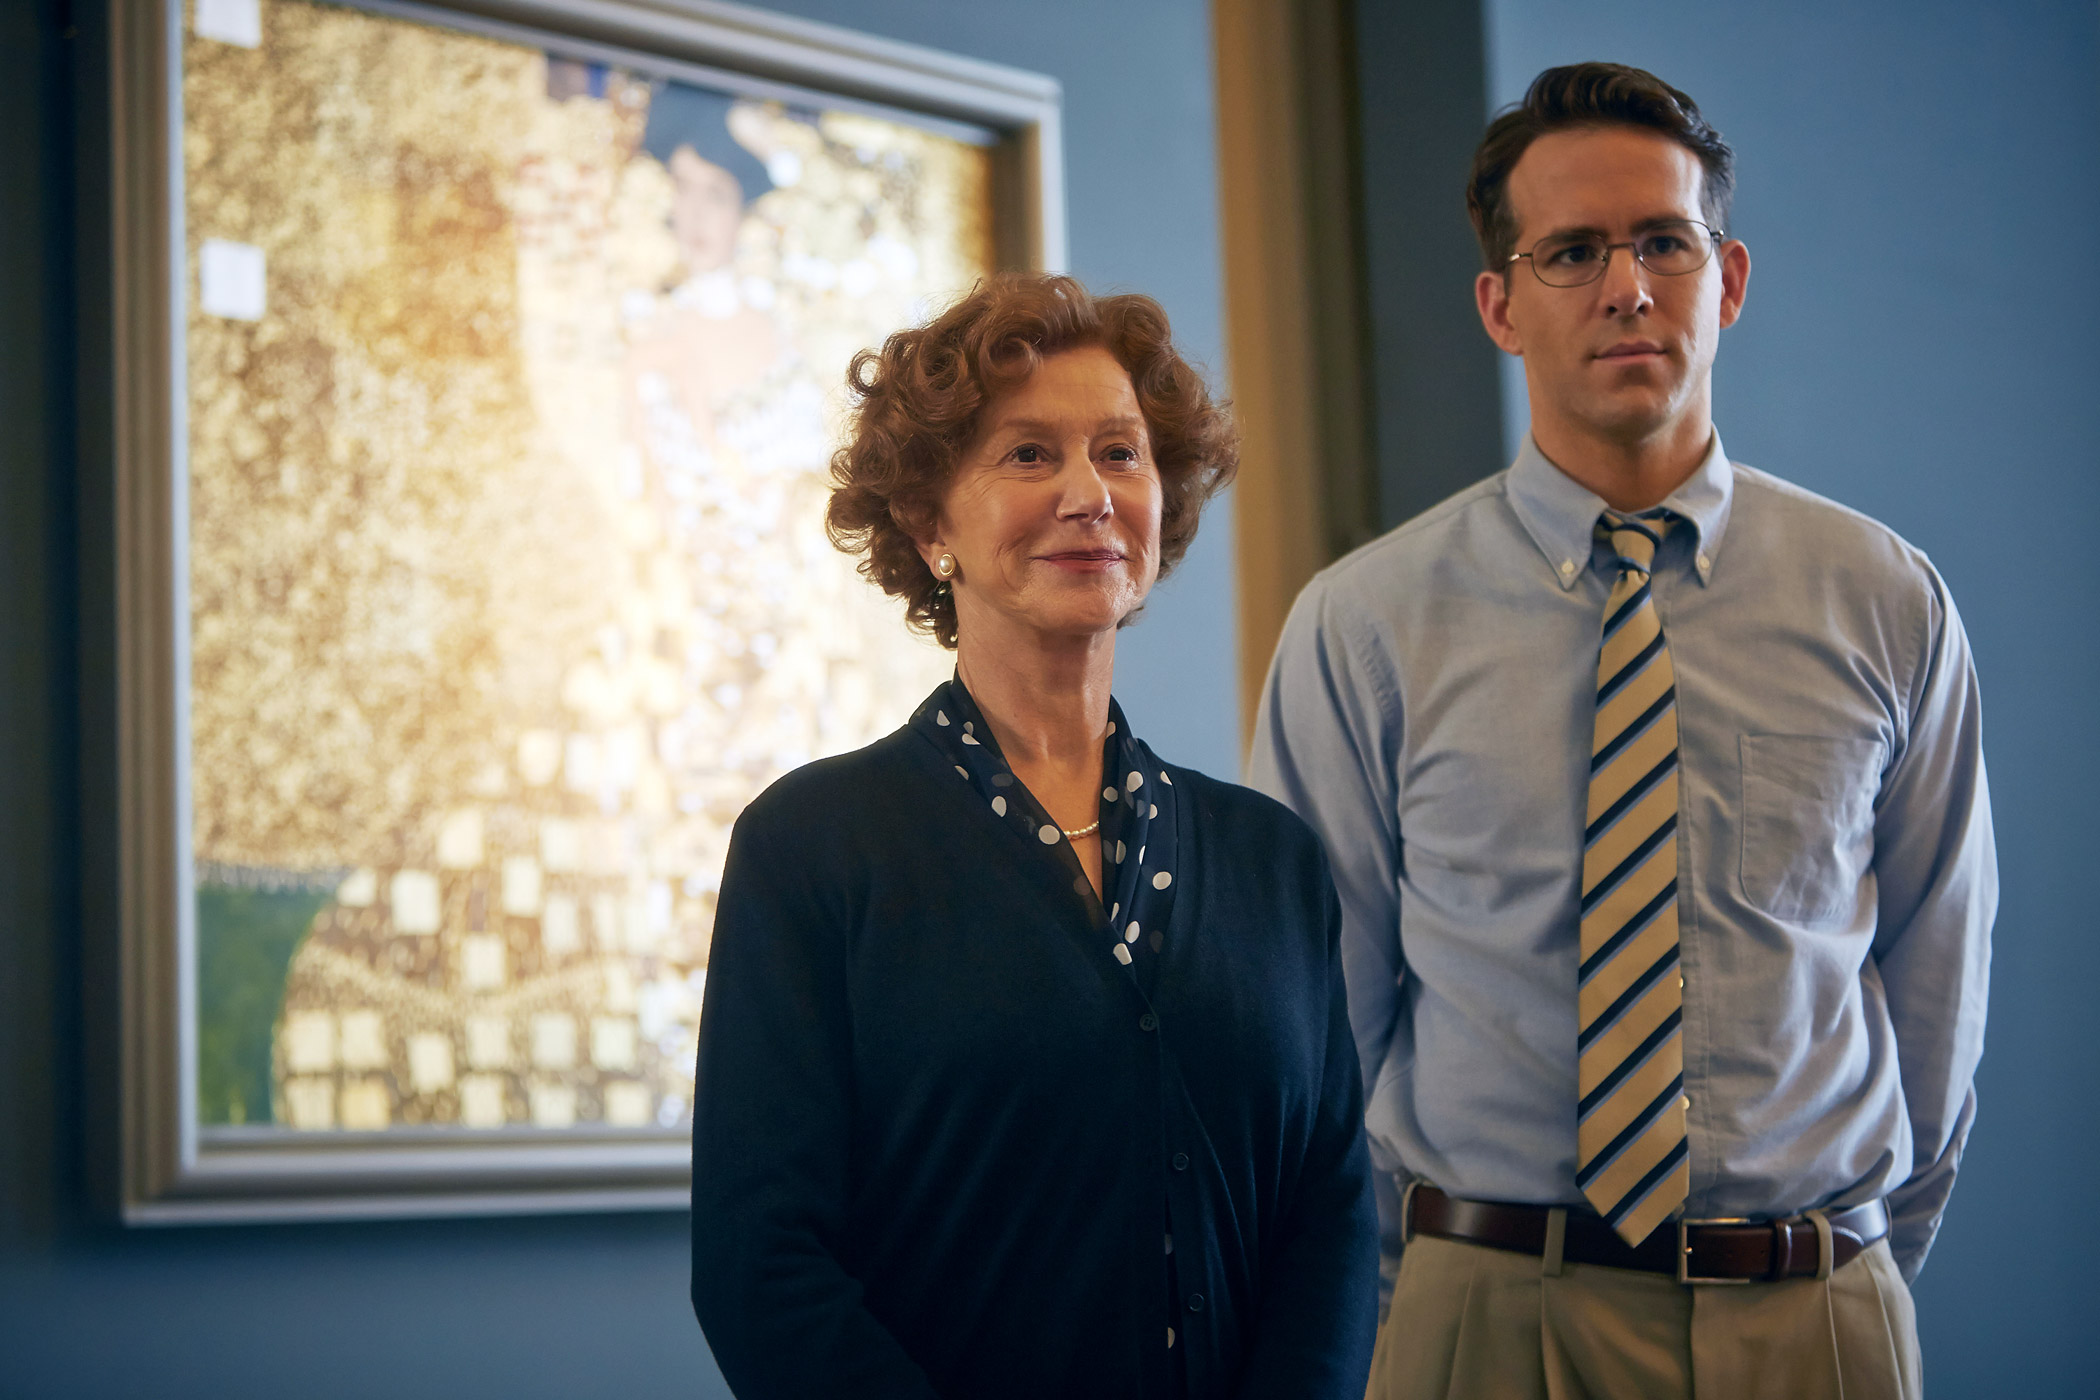 Helen Mirren and Ryan Reynolds star in Woman in Gold